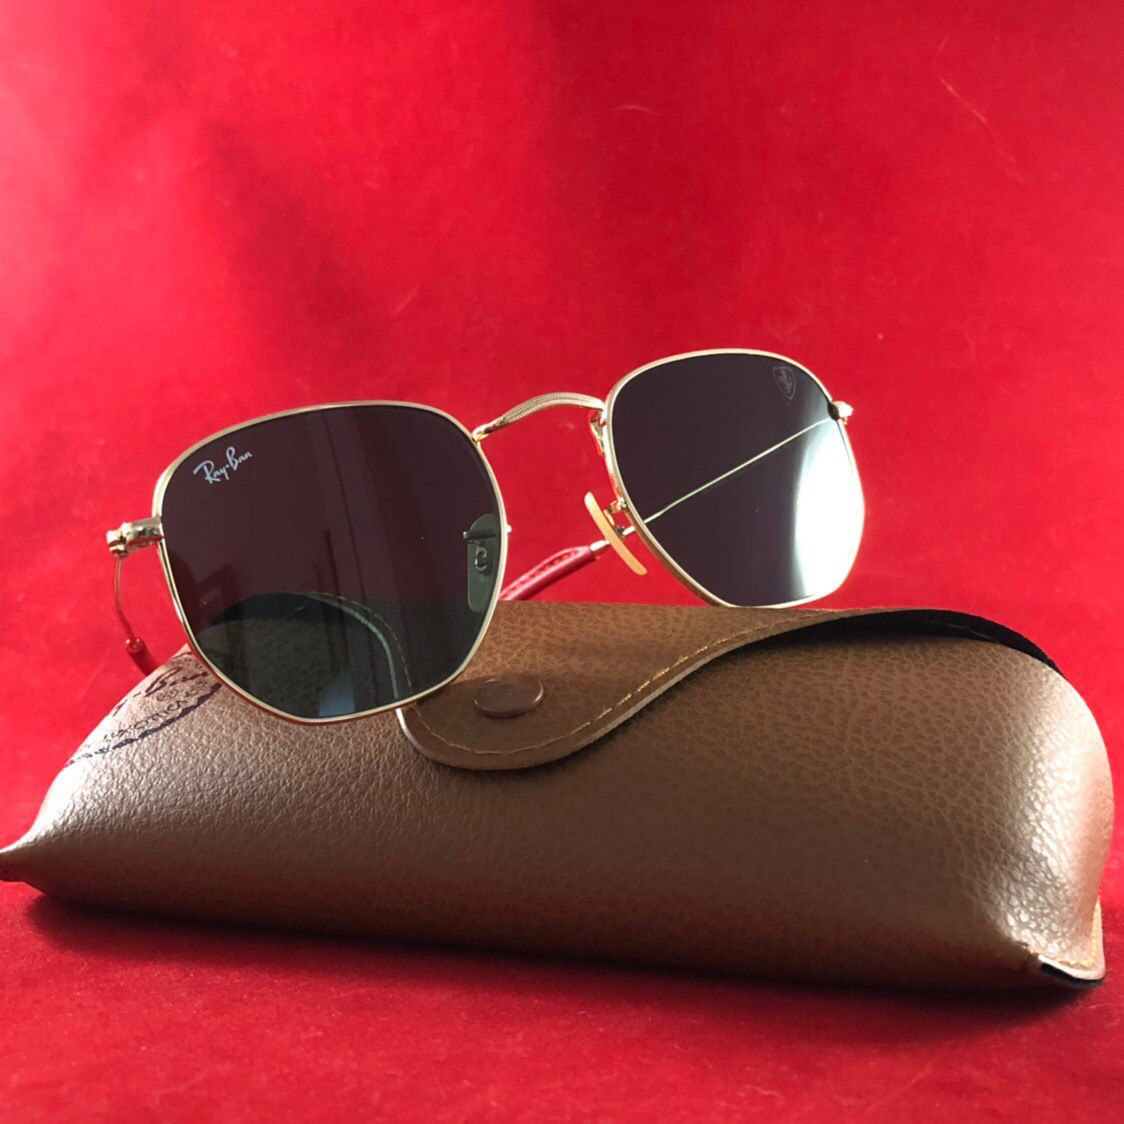 Ray ban Hexagonal 008 sunglasses